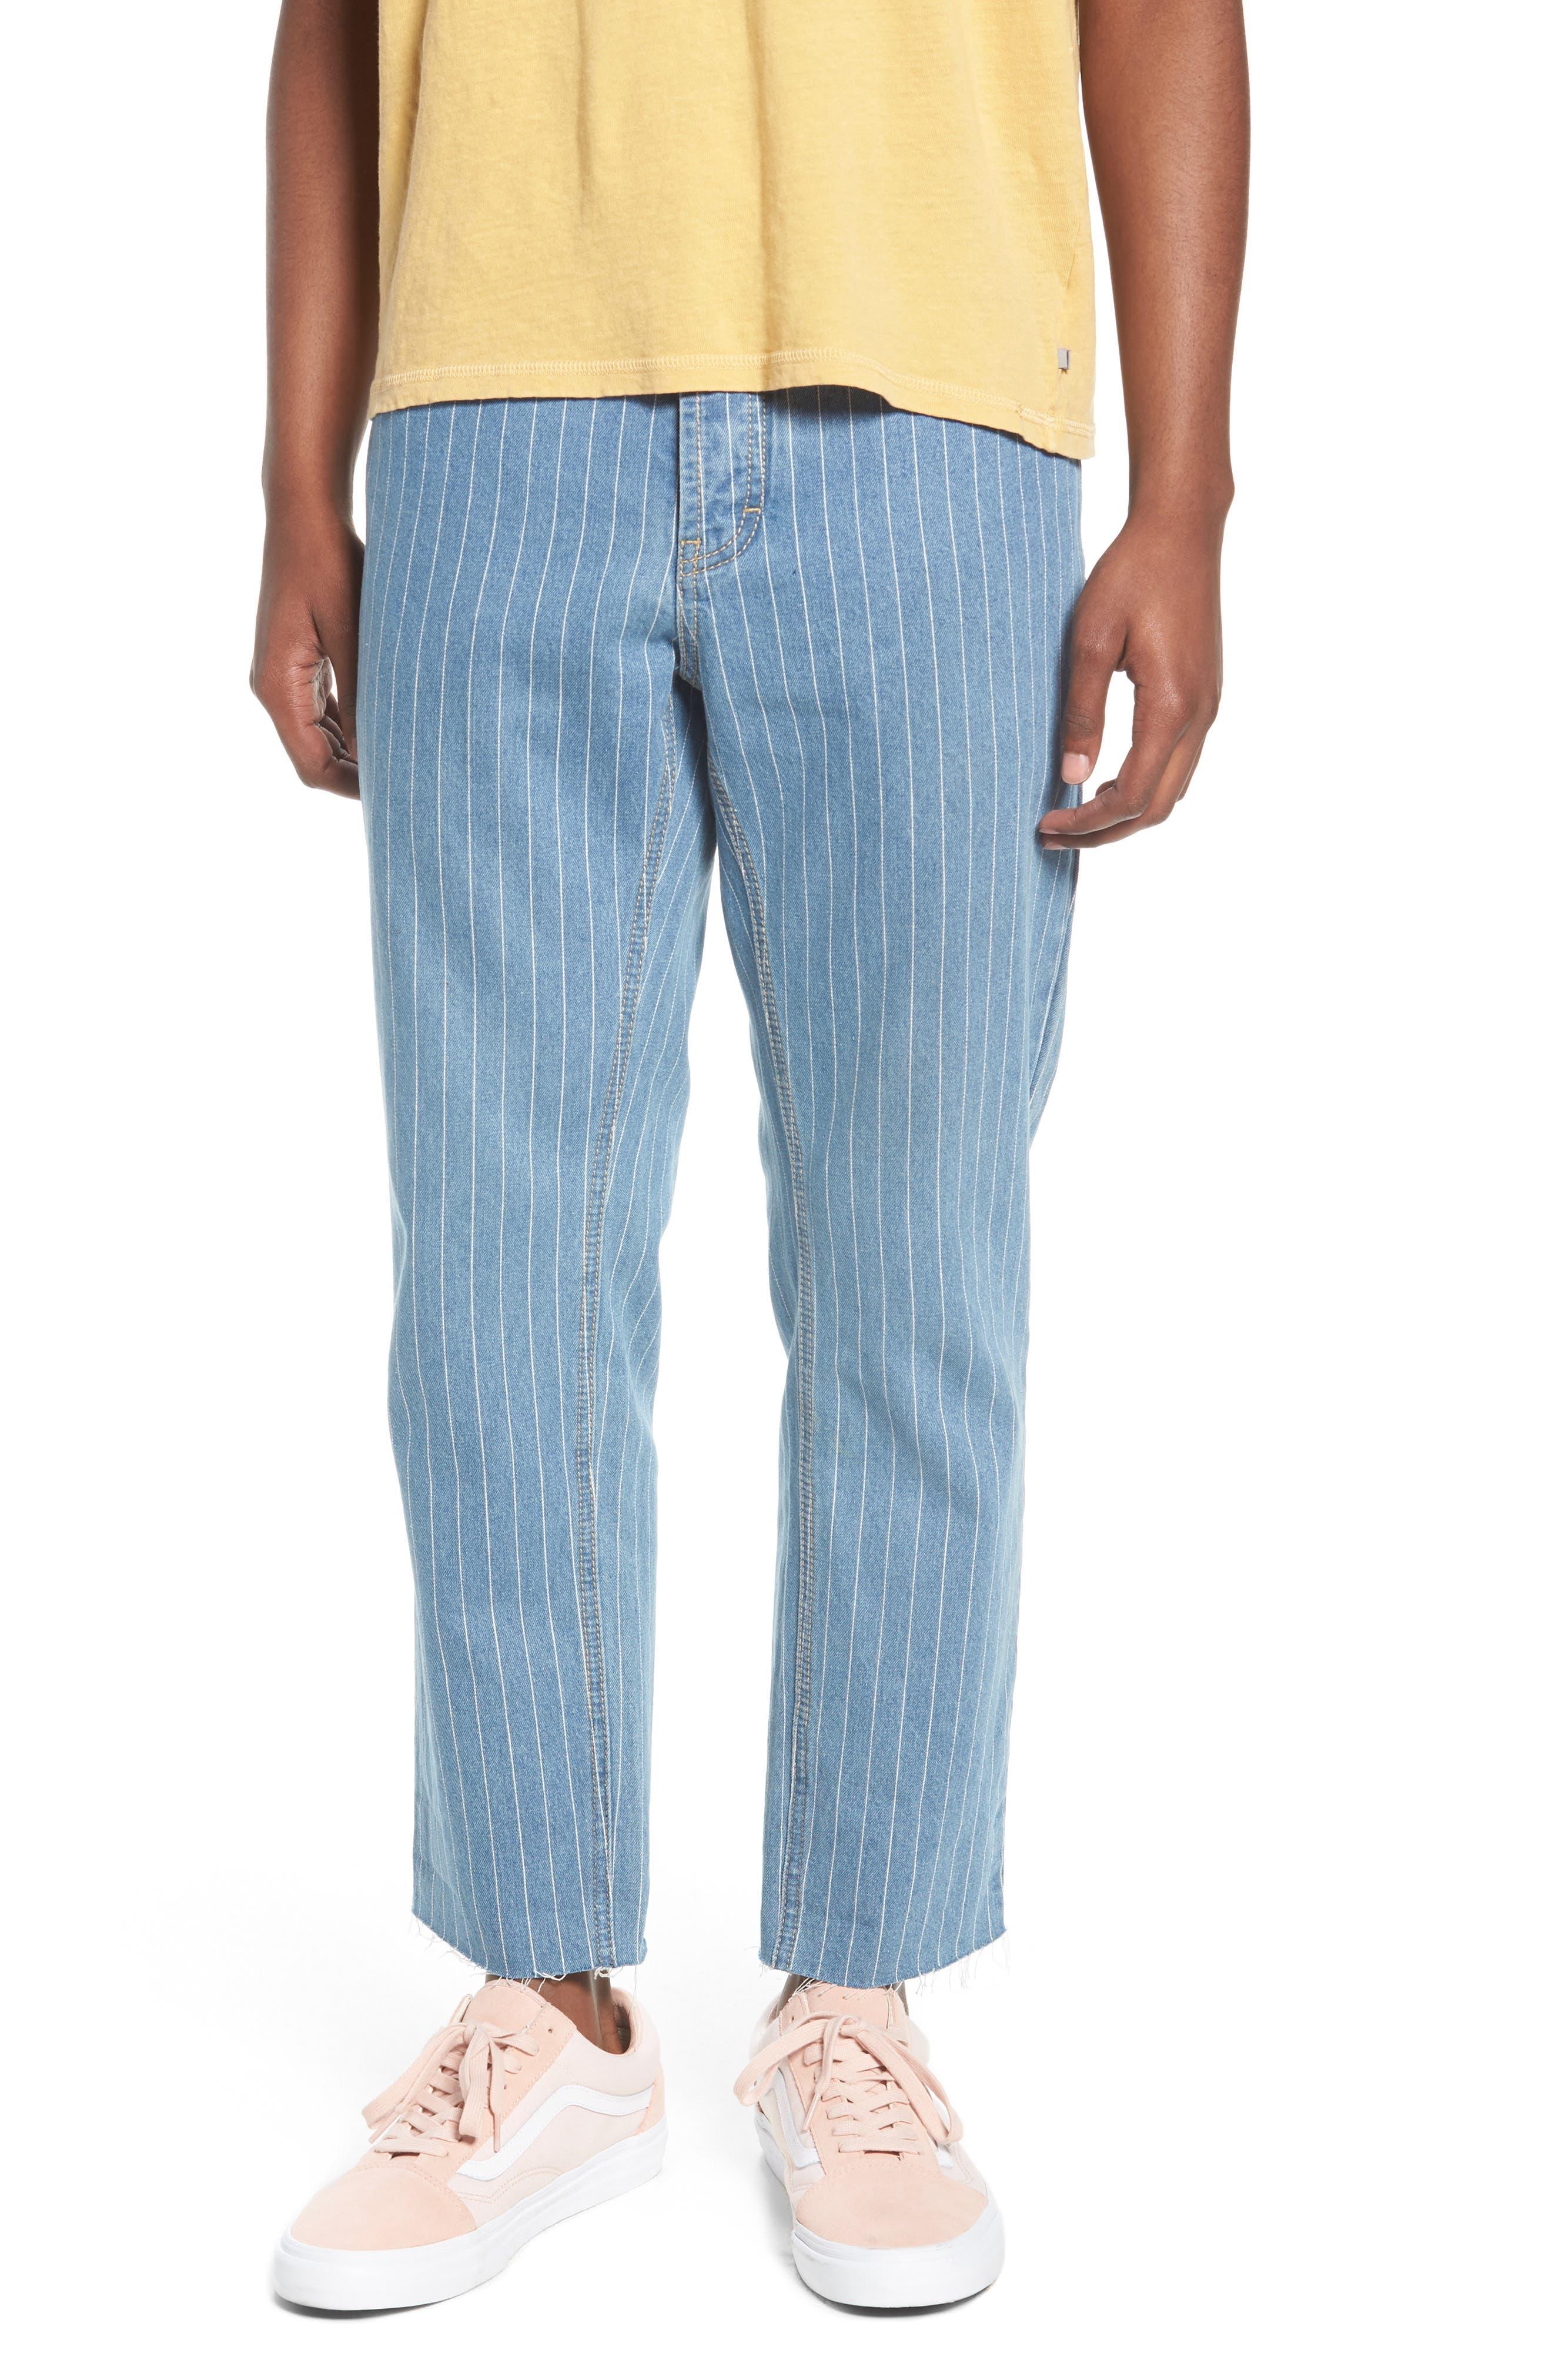 B. Relaxed Jeans,                             Main thumbnail 1, color,                             Stripe Denim Crop